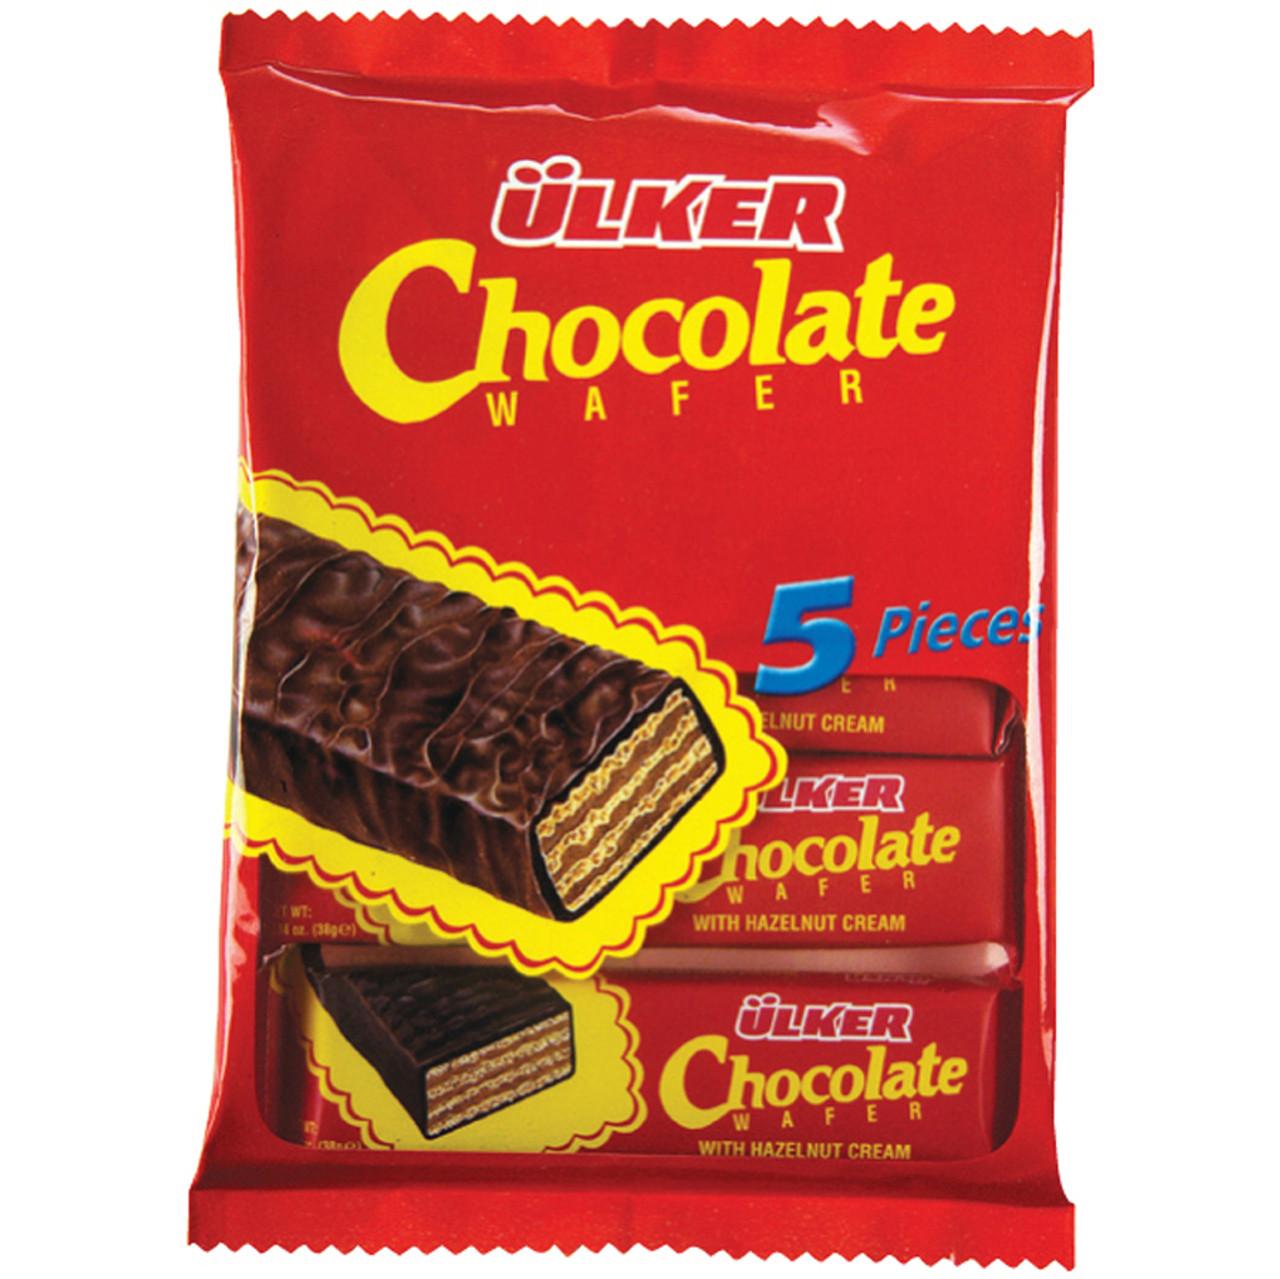 ULKER Chocolate Wafer 5 in 1 Pack (Çikolatalı Gofret 5'li) 190g